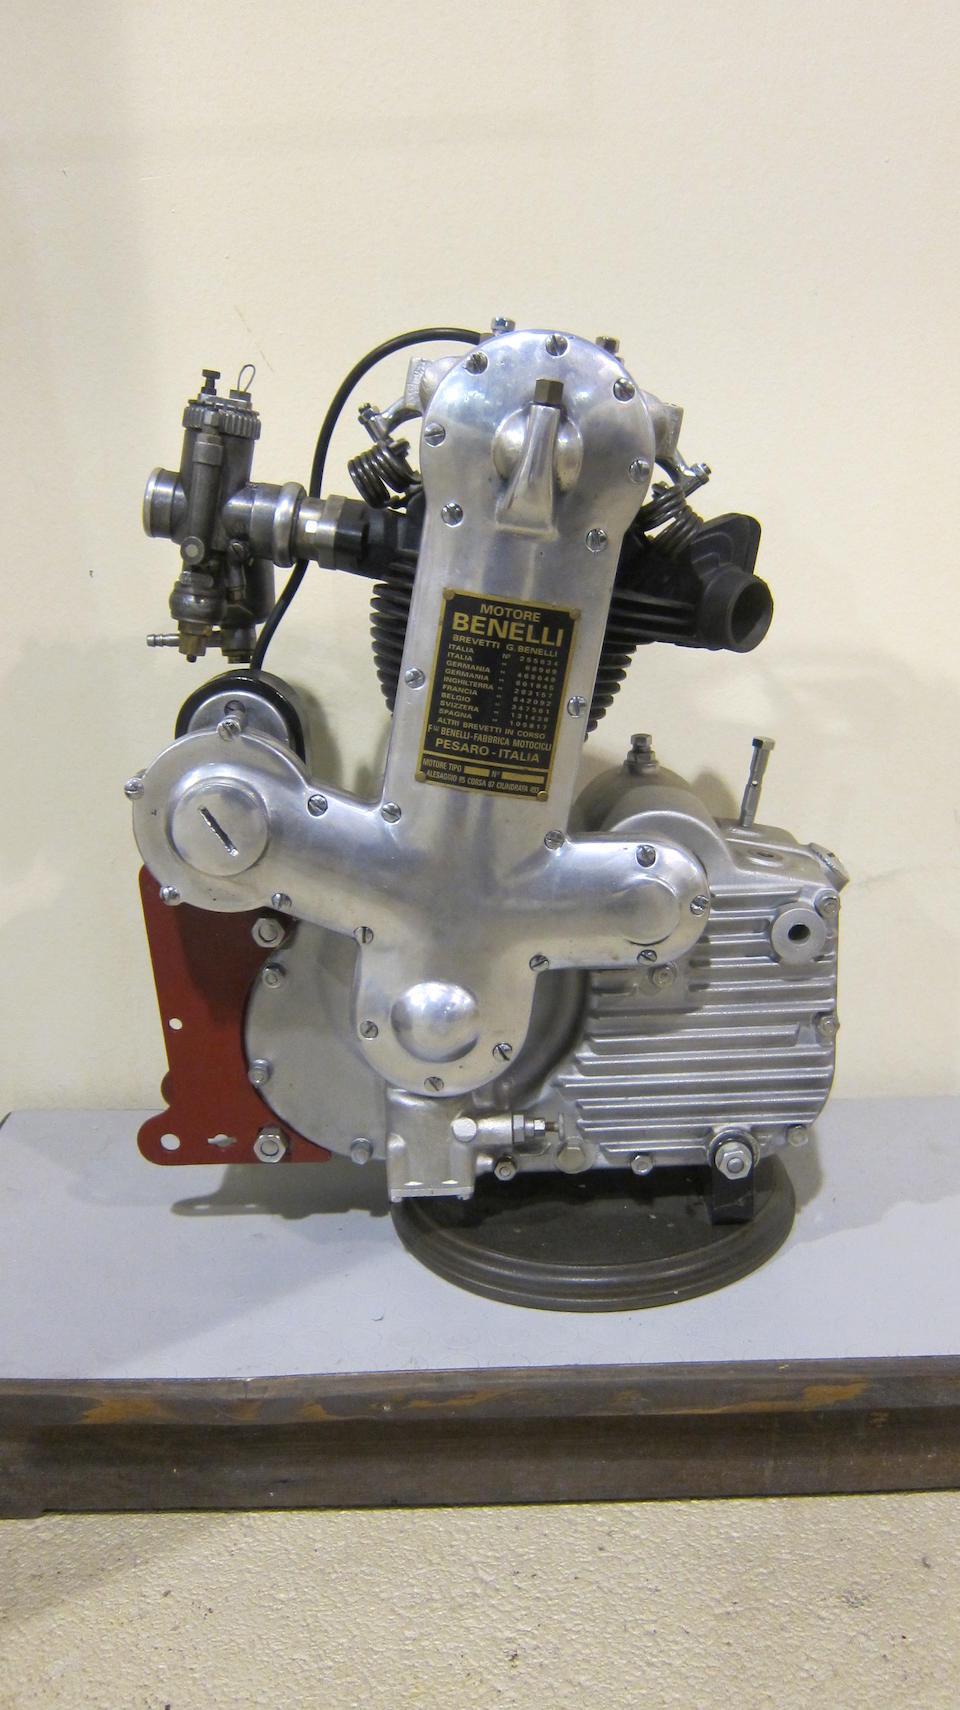 A Benelli Four-stroke OHC engine